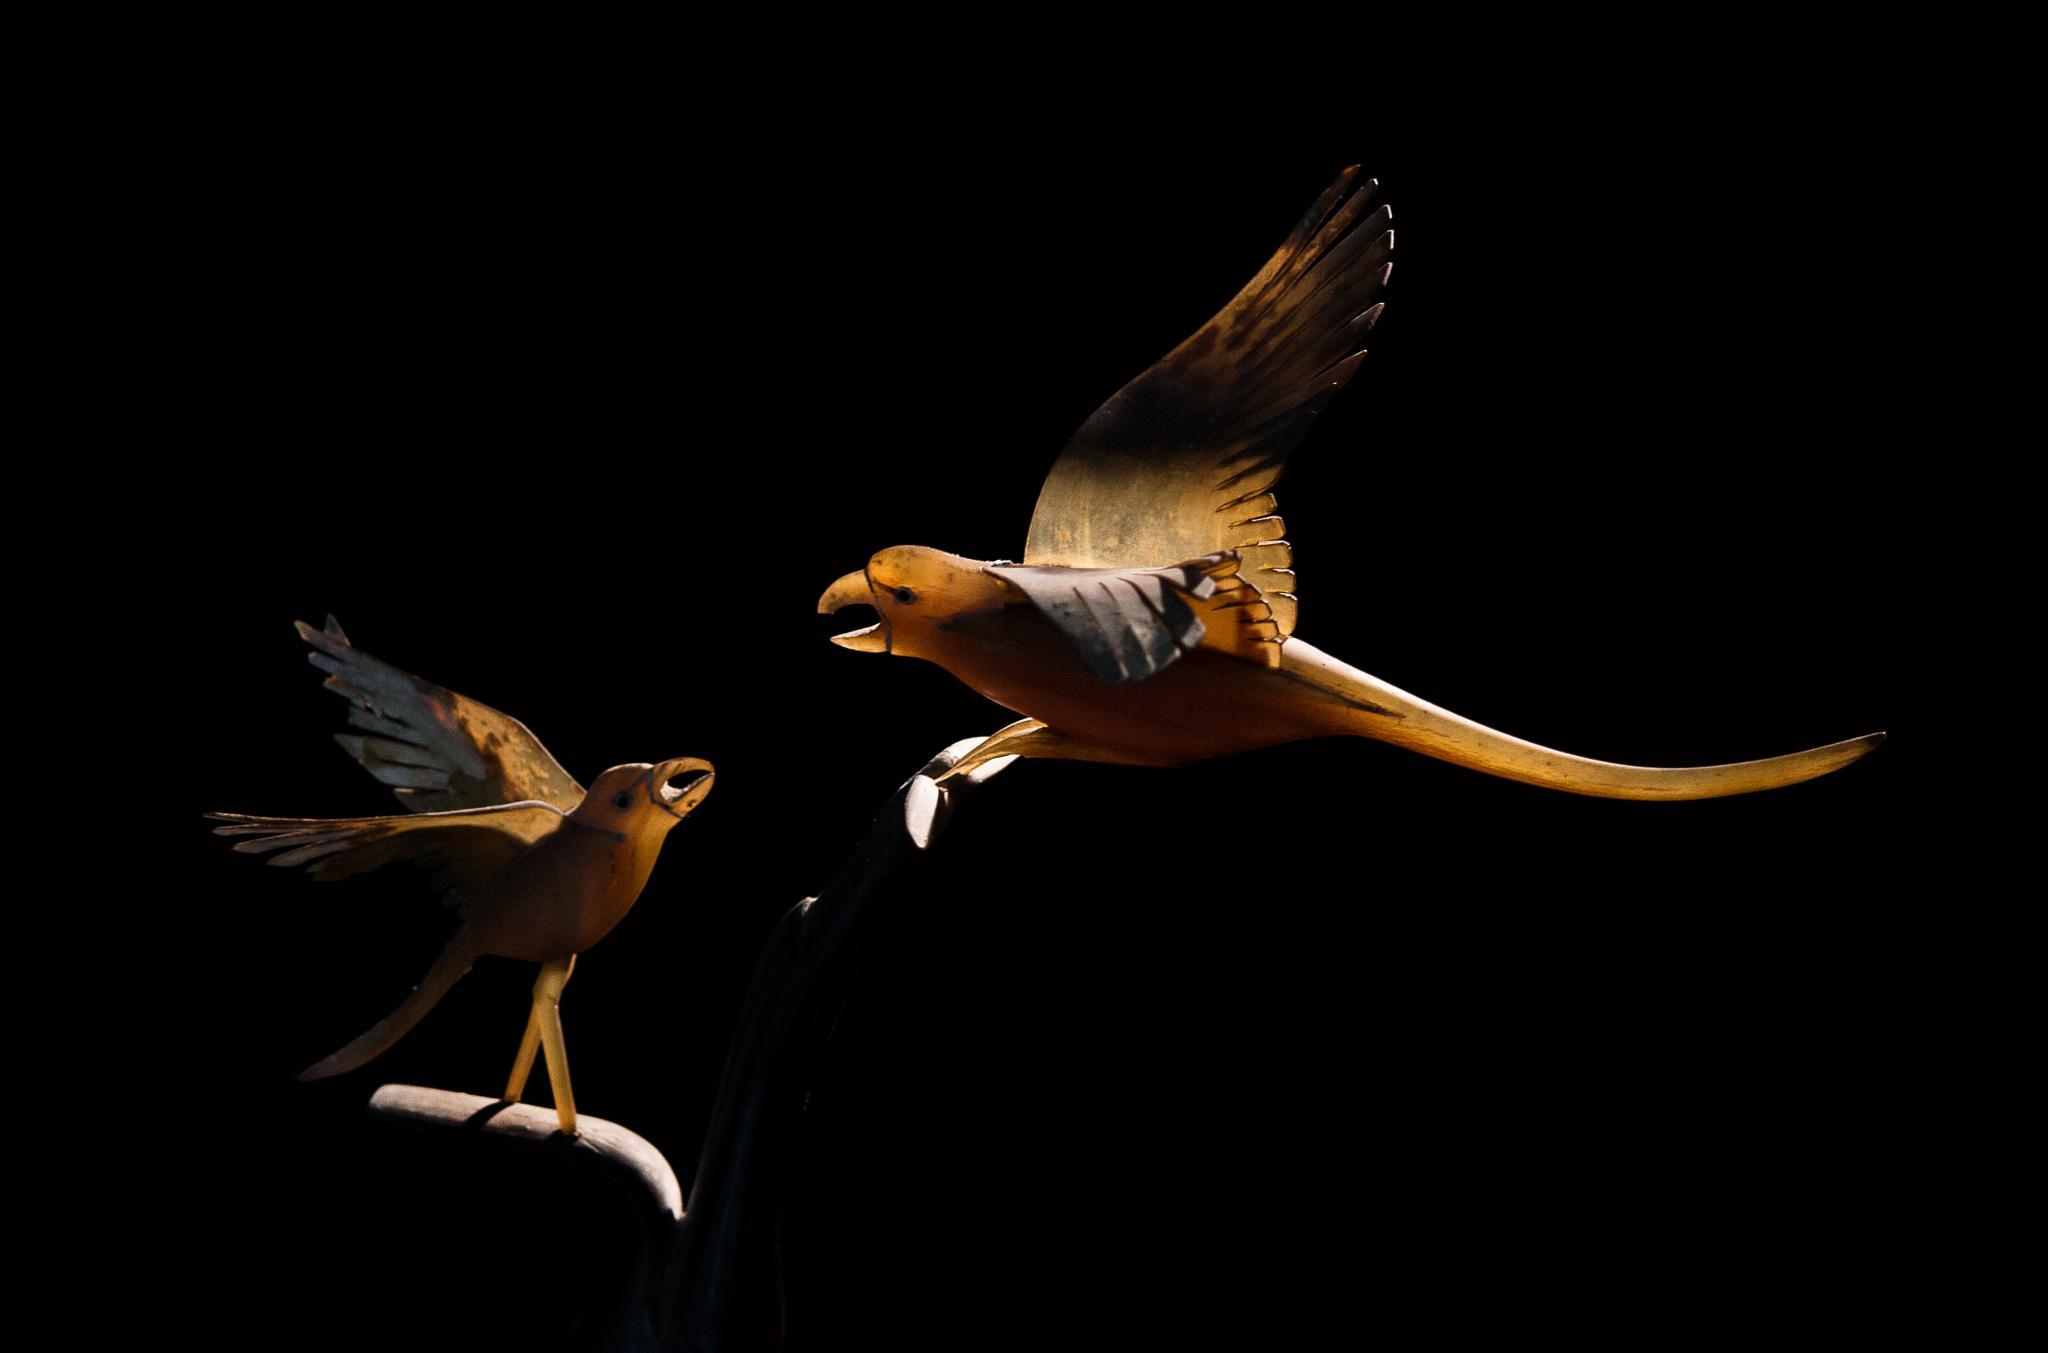 two bird by albertsiraj